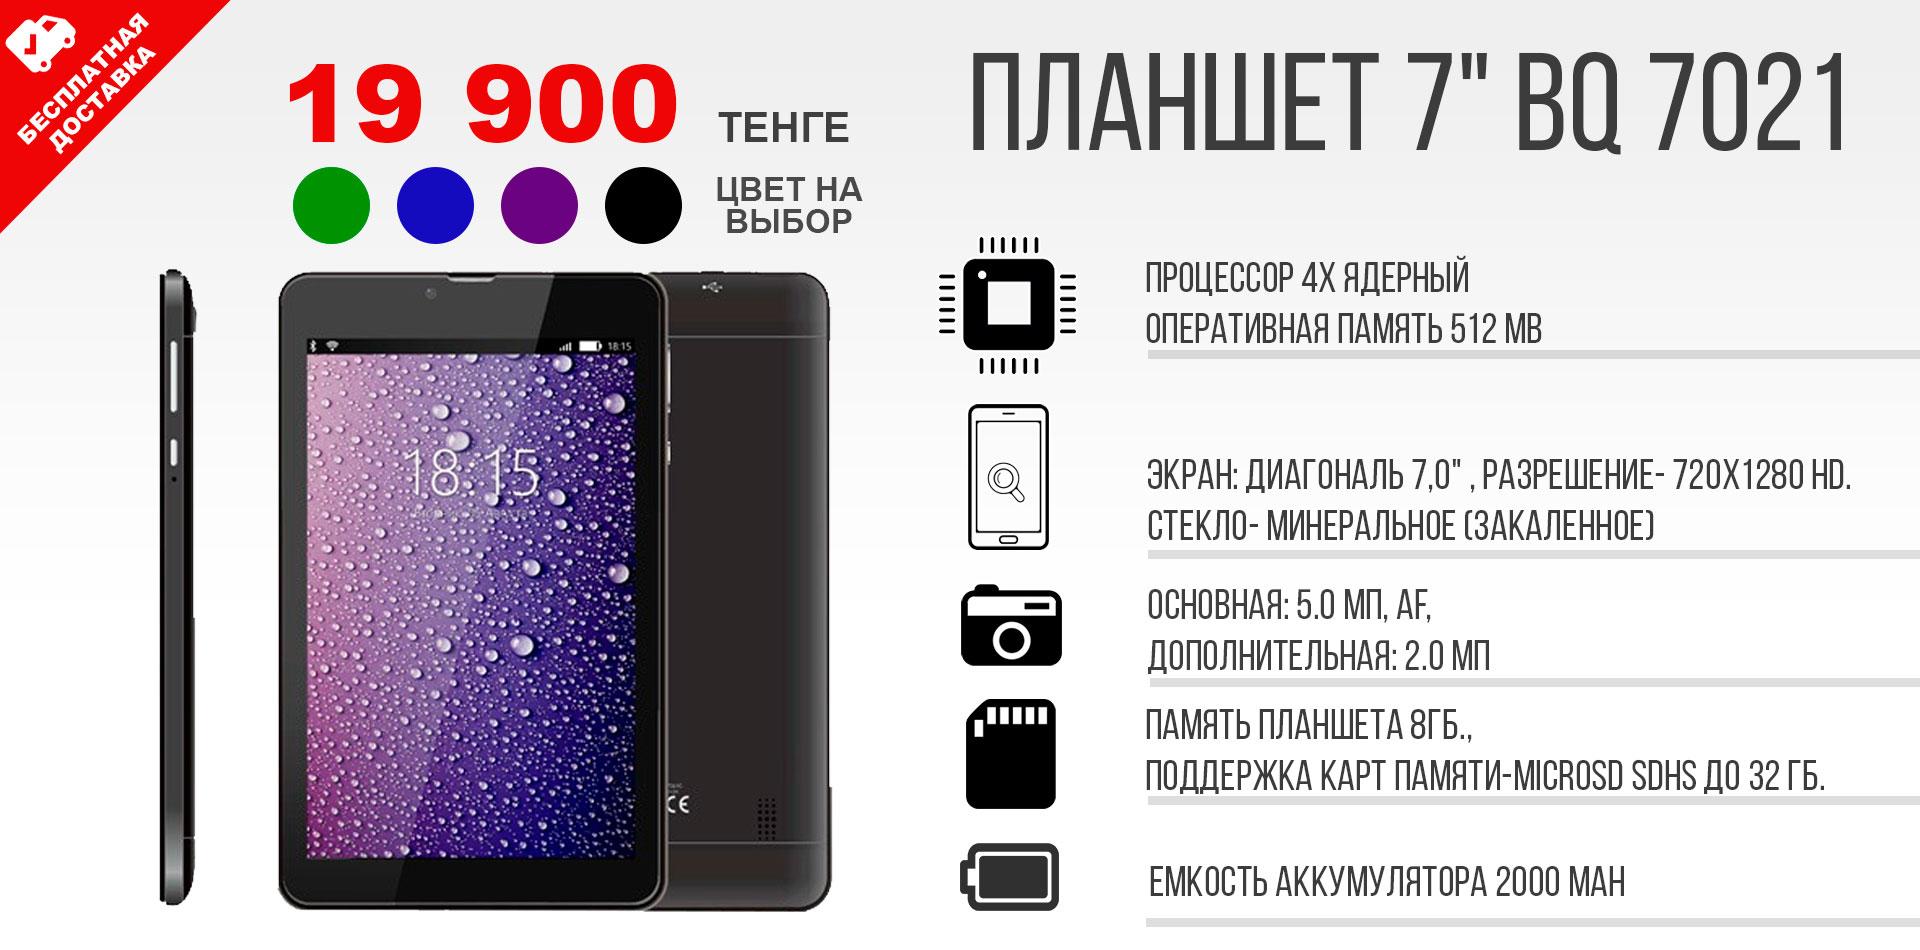 ПЛАНШЕТ BQ 7021 C 3G